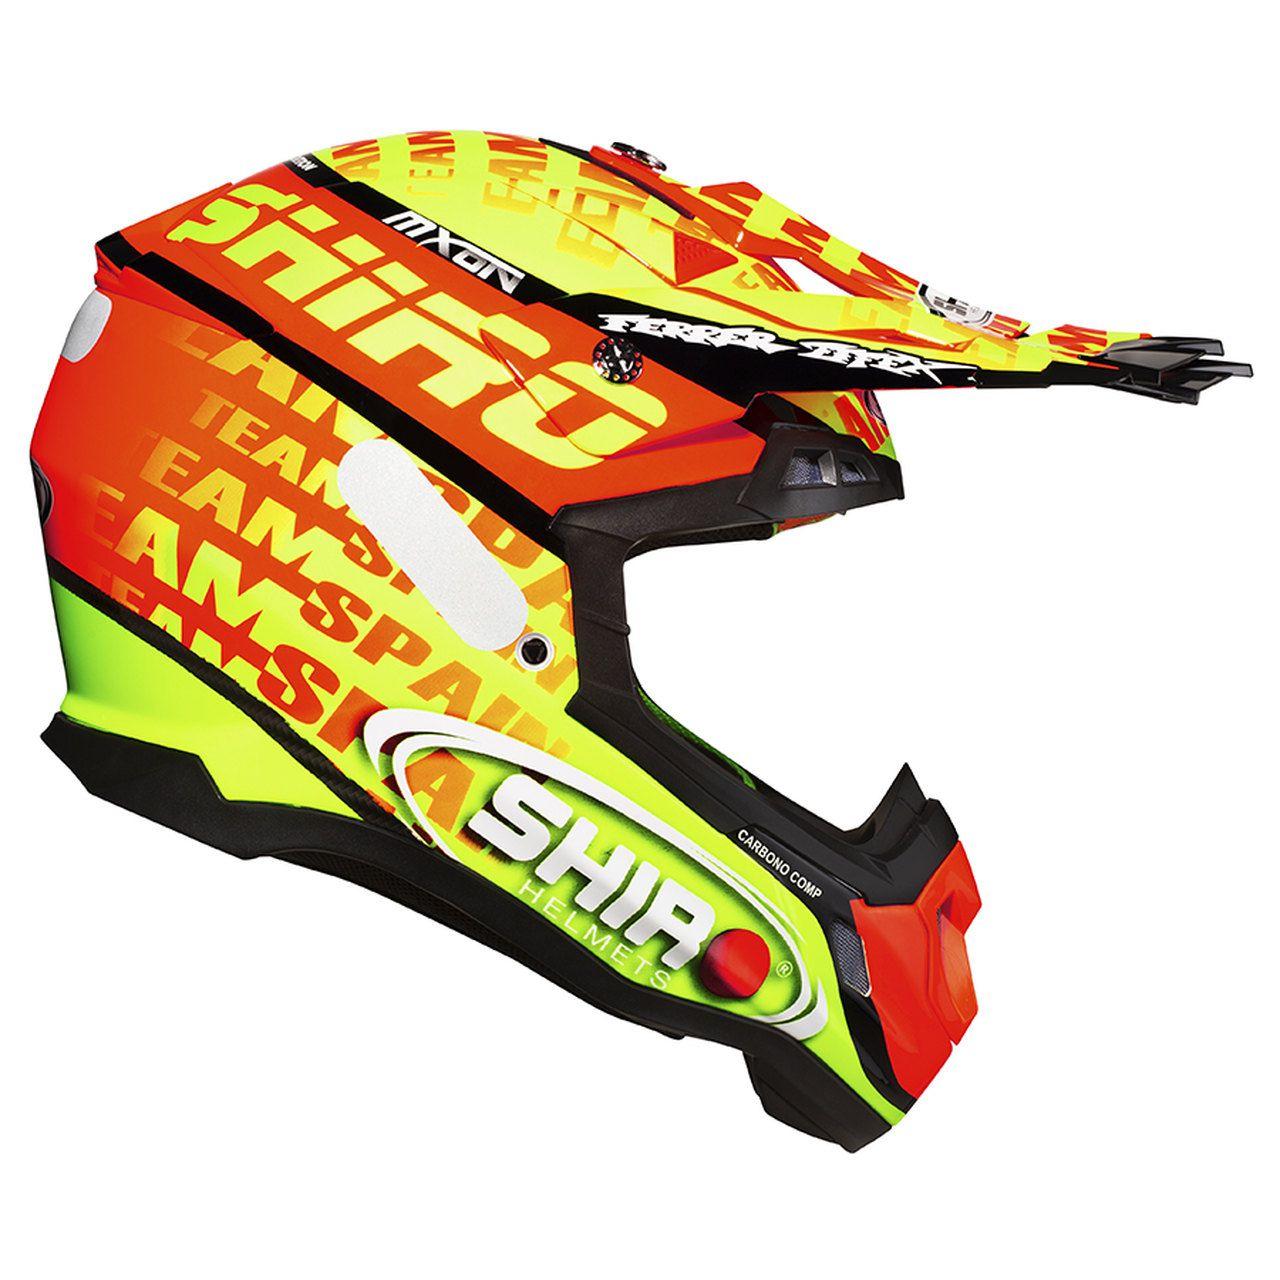 Capacete Shiro Motocross Off Road MX-917 Mxon Amarelo e Laranja